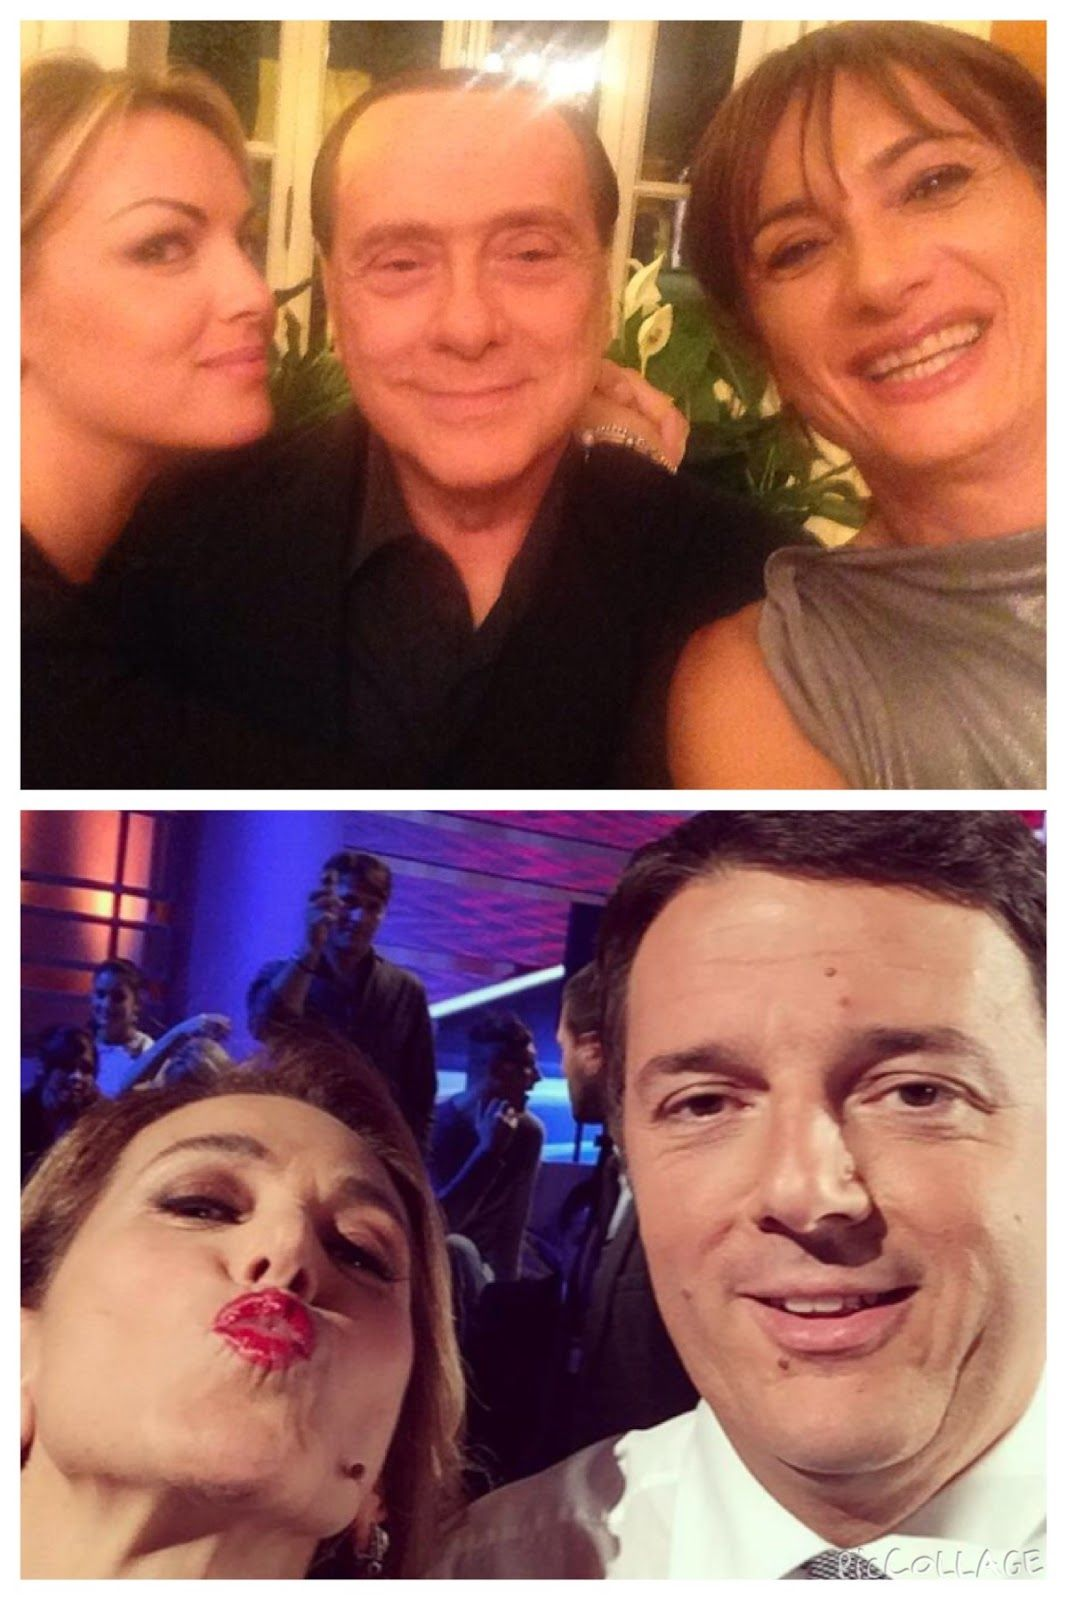 http://4.bp.blogspot.com/-7DiEUcznkx8/VETprCaE9xI/AAAAAAAAr7s/Hm2am8ZPvRw/s1600/Foto%2B20-10-14%2B12%2B49%2B32.jpg Al selfie di Vladimir Luxuria con Silvio Berlusconi e Francesco Pascale, il premier Matteo Renzi risponde selfandosi da Barbara D'Urso.